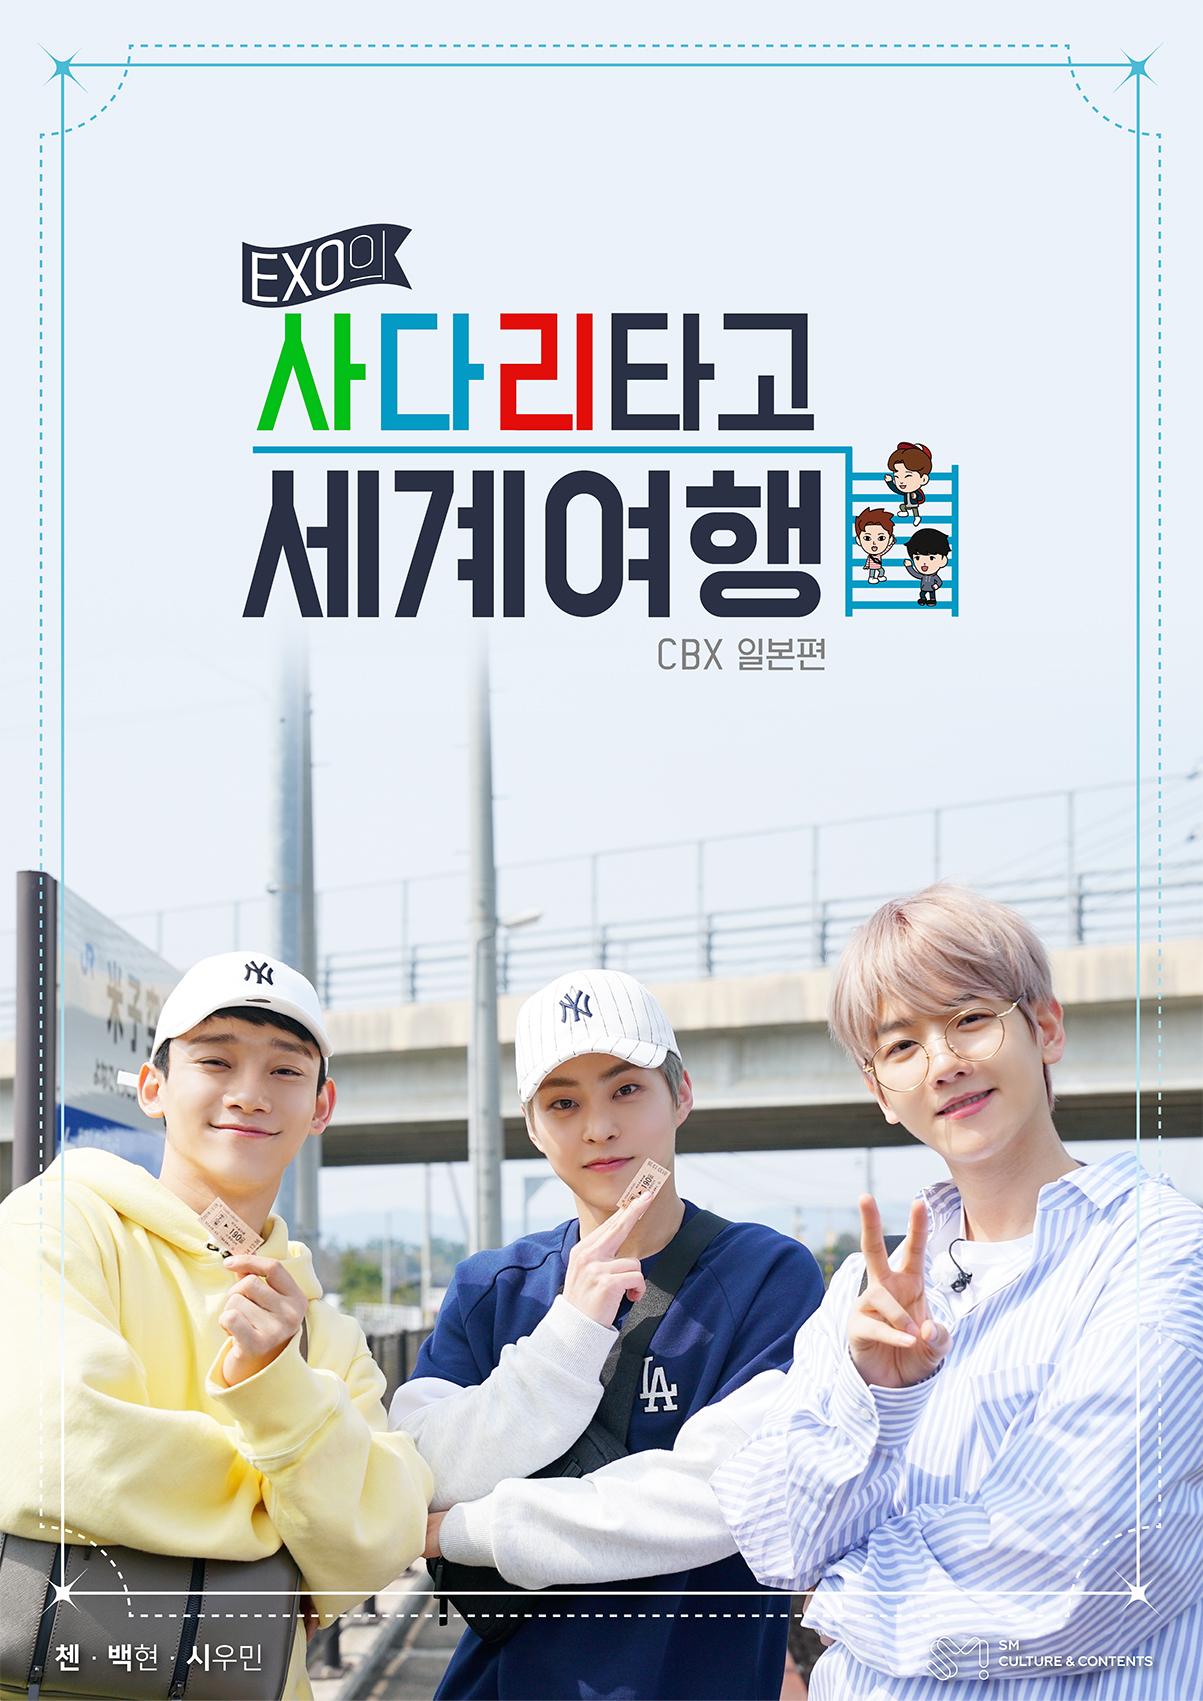 EXO-CBX真人秀《EXO的爬梯子世界旅行》5月21号首播